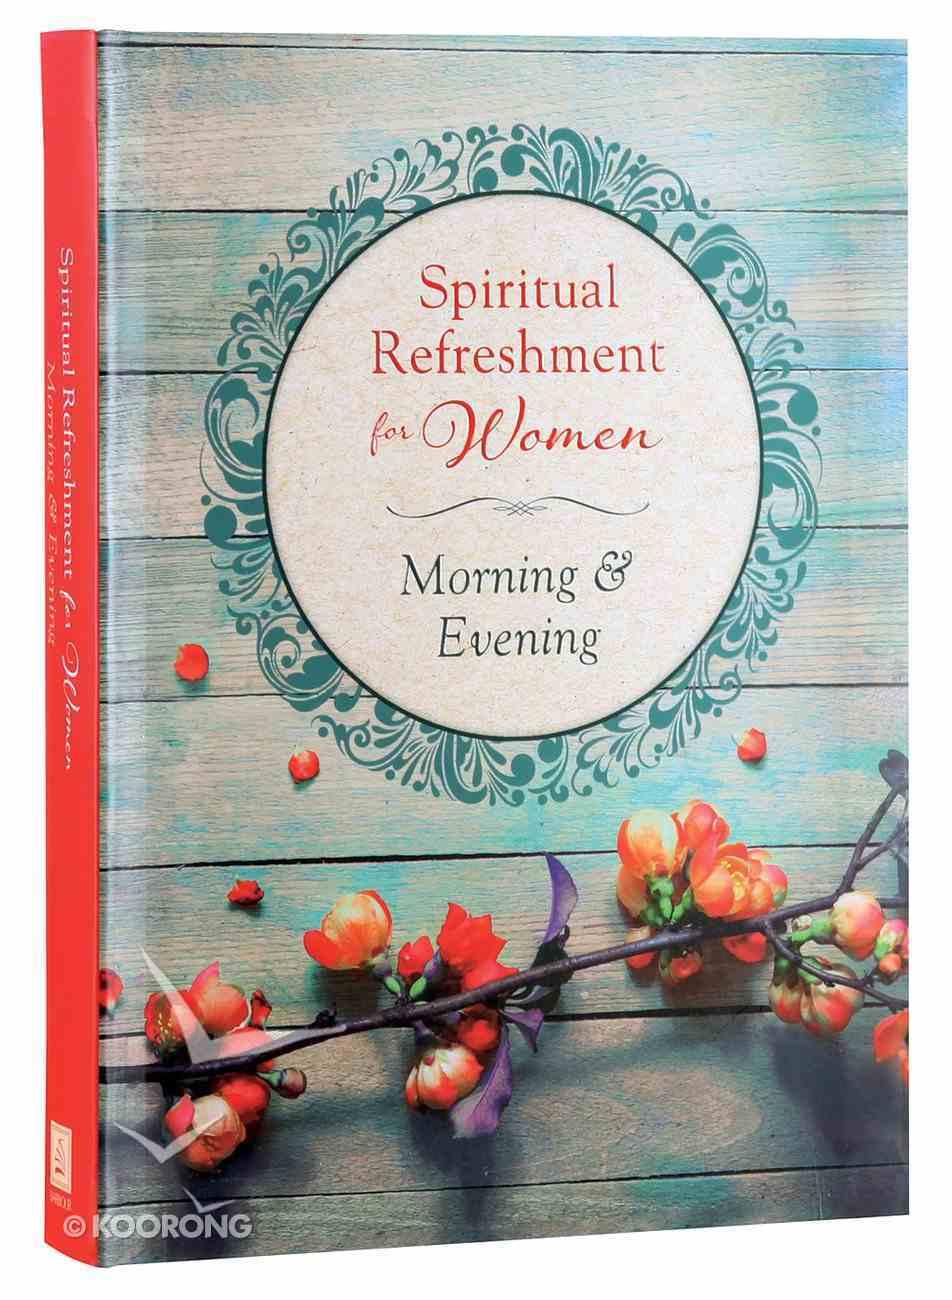 Morning & Evening (Spiritual Refreshment For Women Series) Paperback